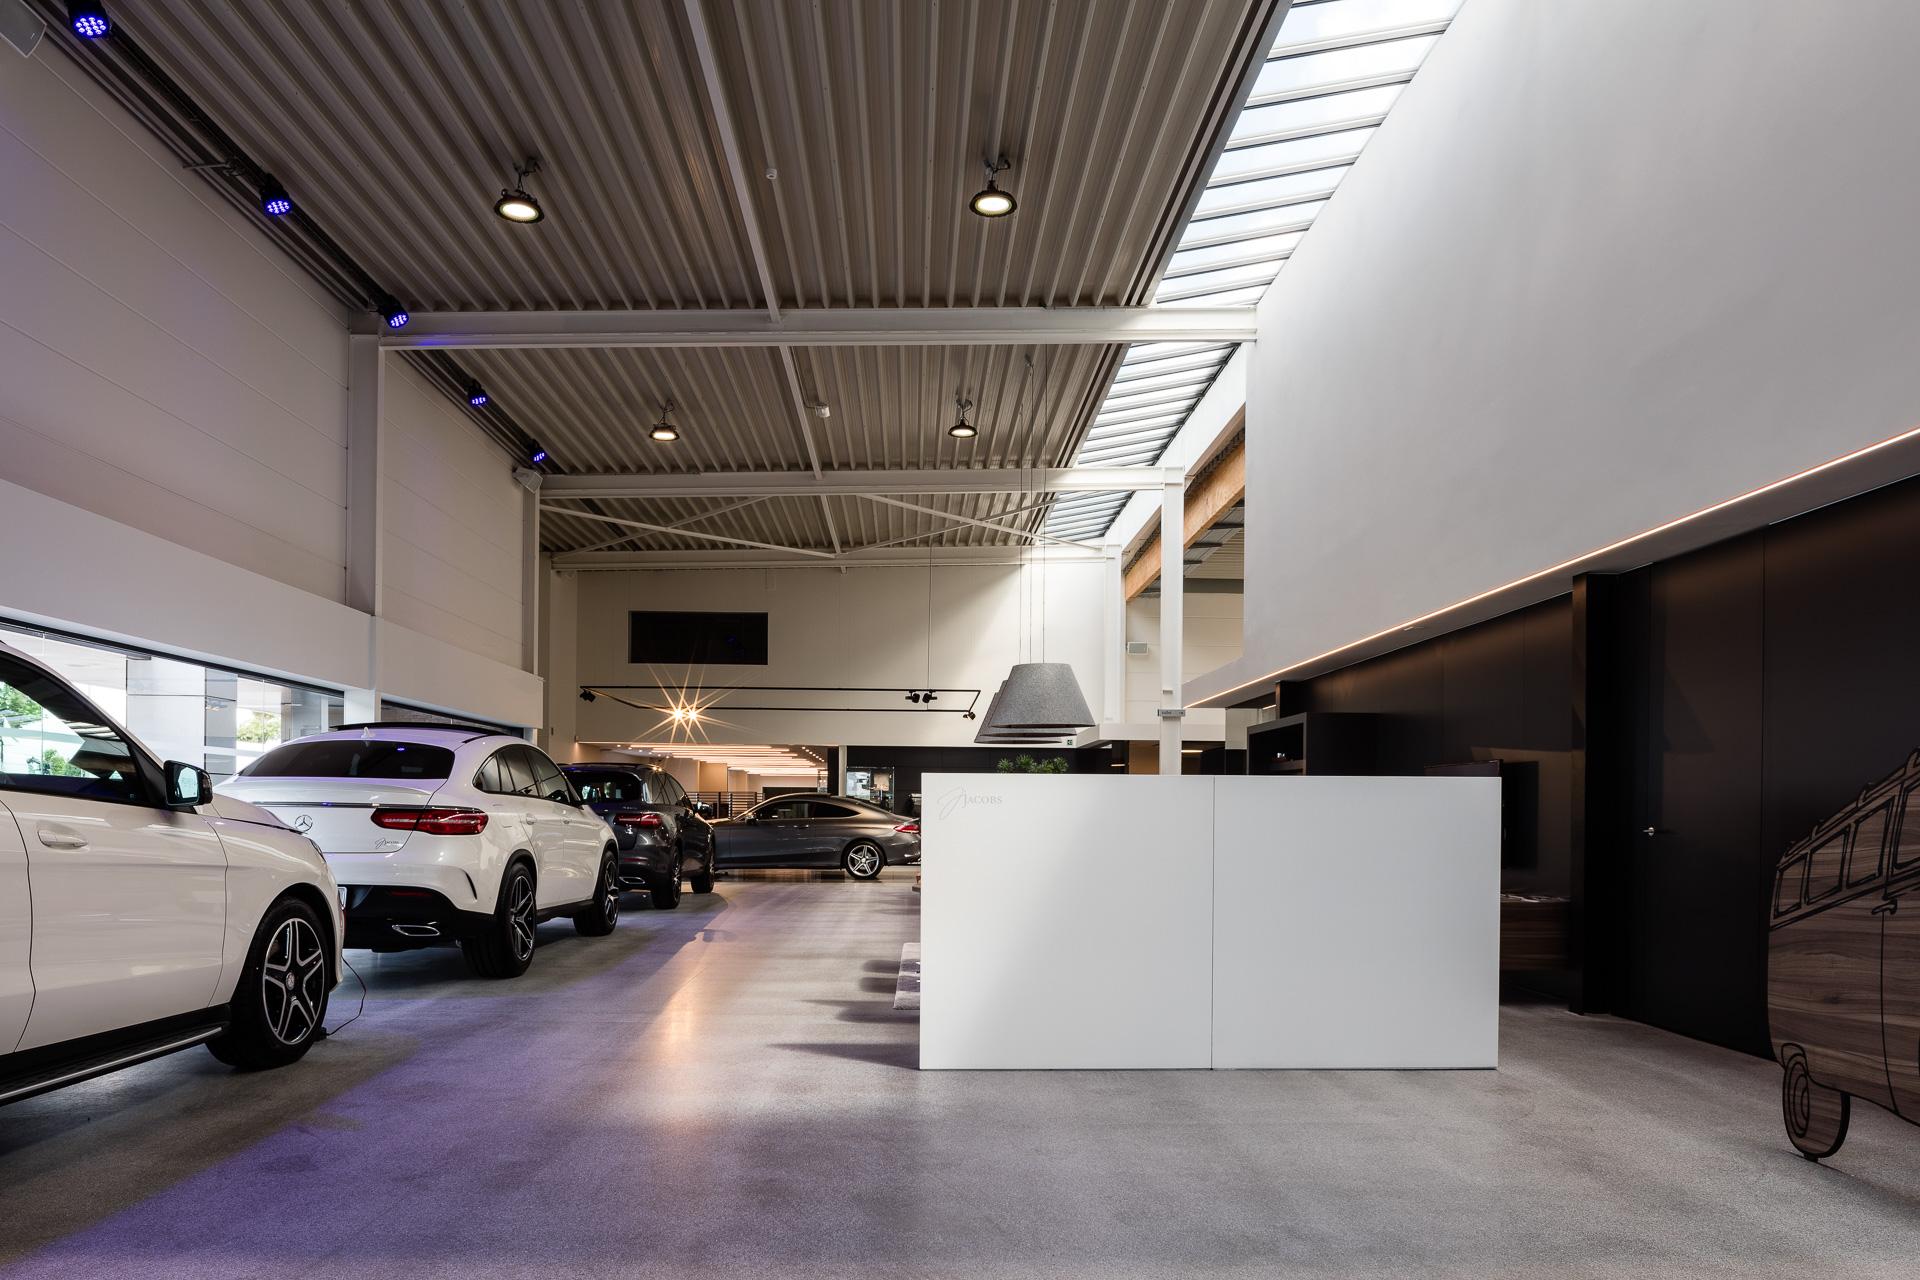 interieurfotografie-dtonic-electro-verbeke-full-025